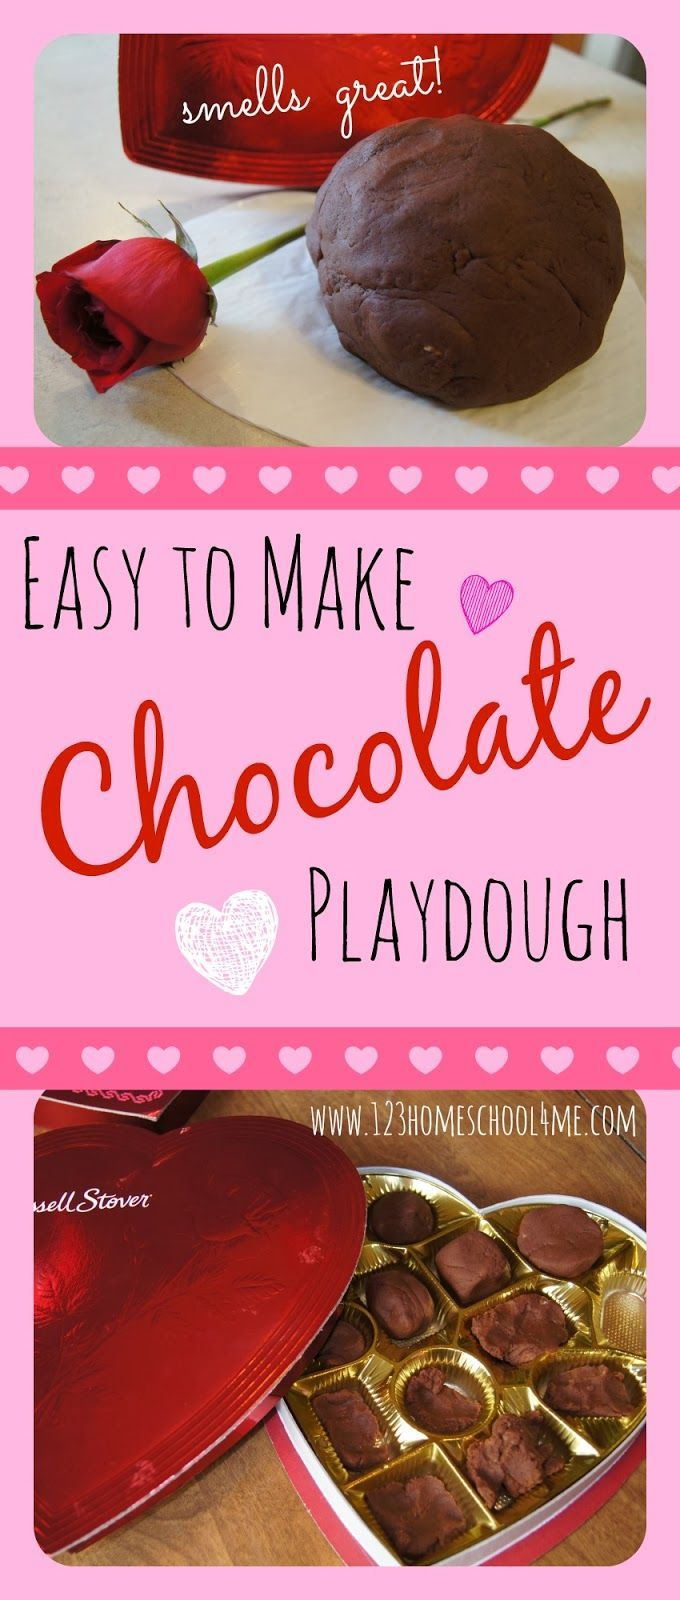 EASY Chocolate Playdough Recipe